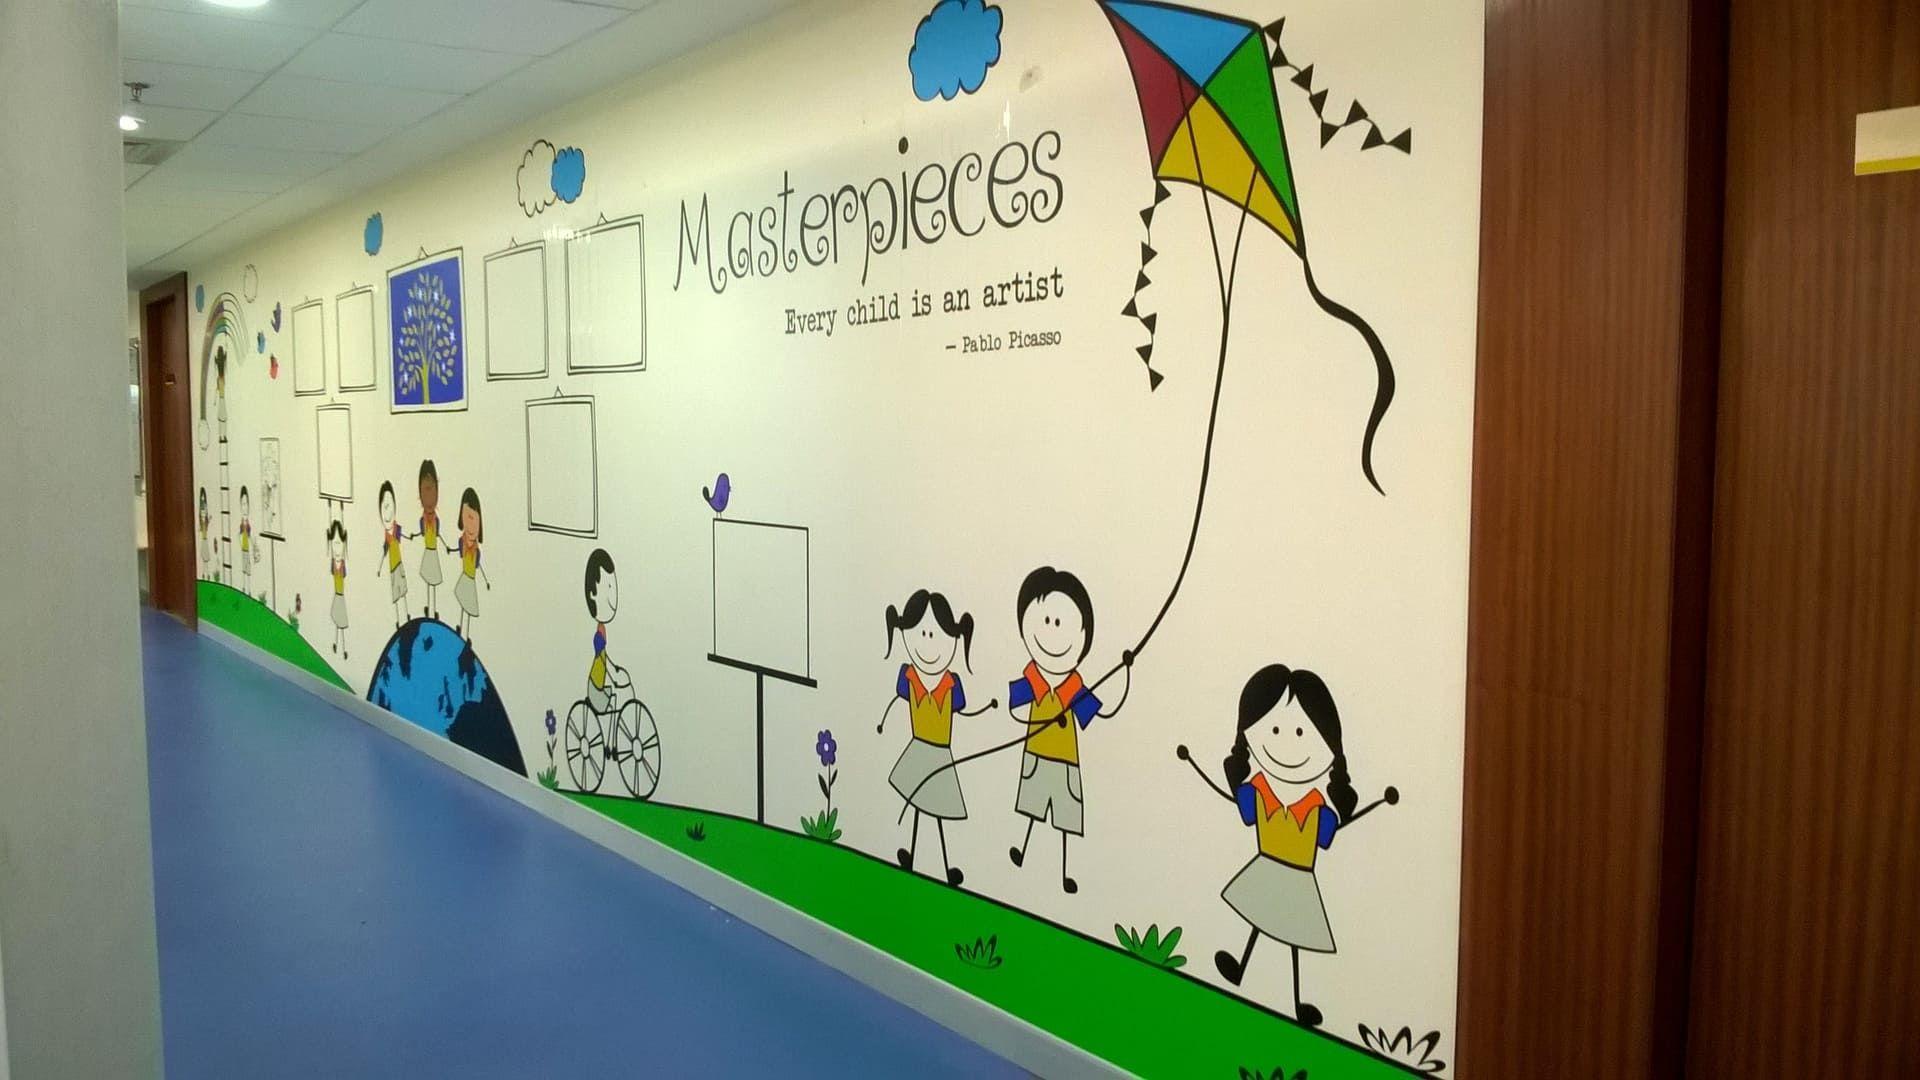 Mockingbird Studios Mumbai Customized Wall Graphics Decals Wallpapers Canvas Schools 7 School Wall Graphics Graphic